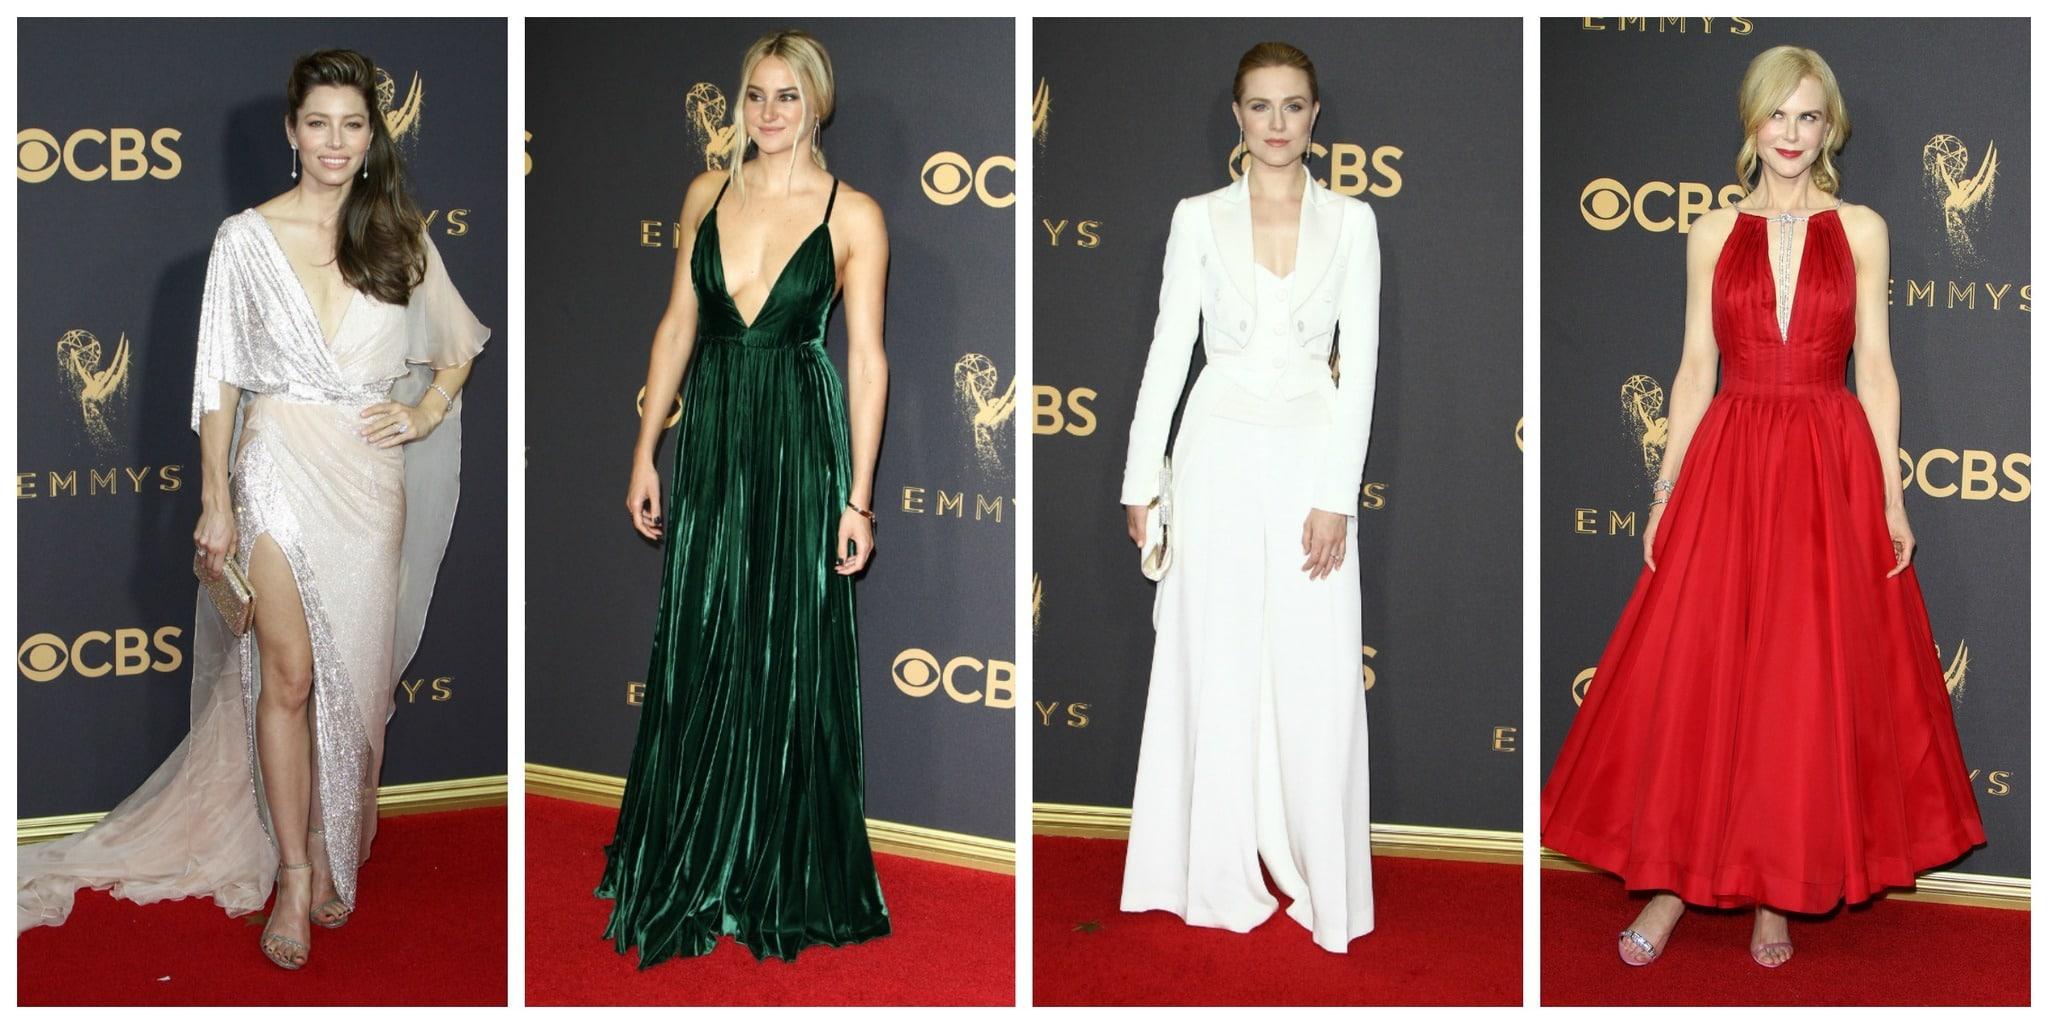 Emmys 2017 Best Dressed: Jessica Biel, Shailene Woodley, Evan Rachel Wood, Nicole Kidman